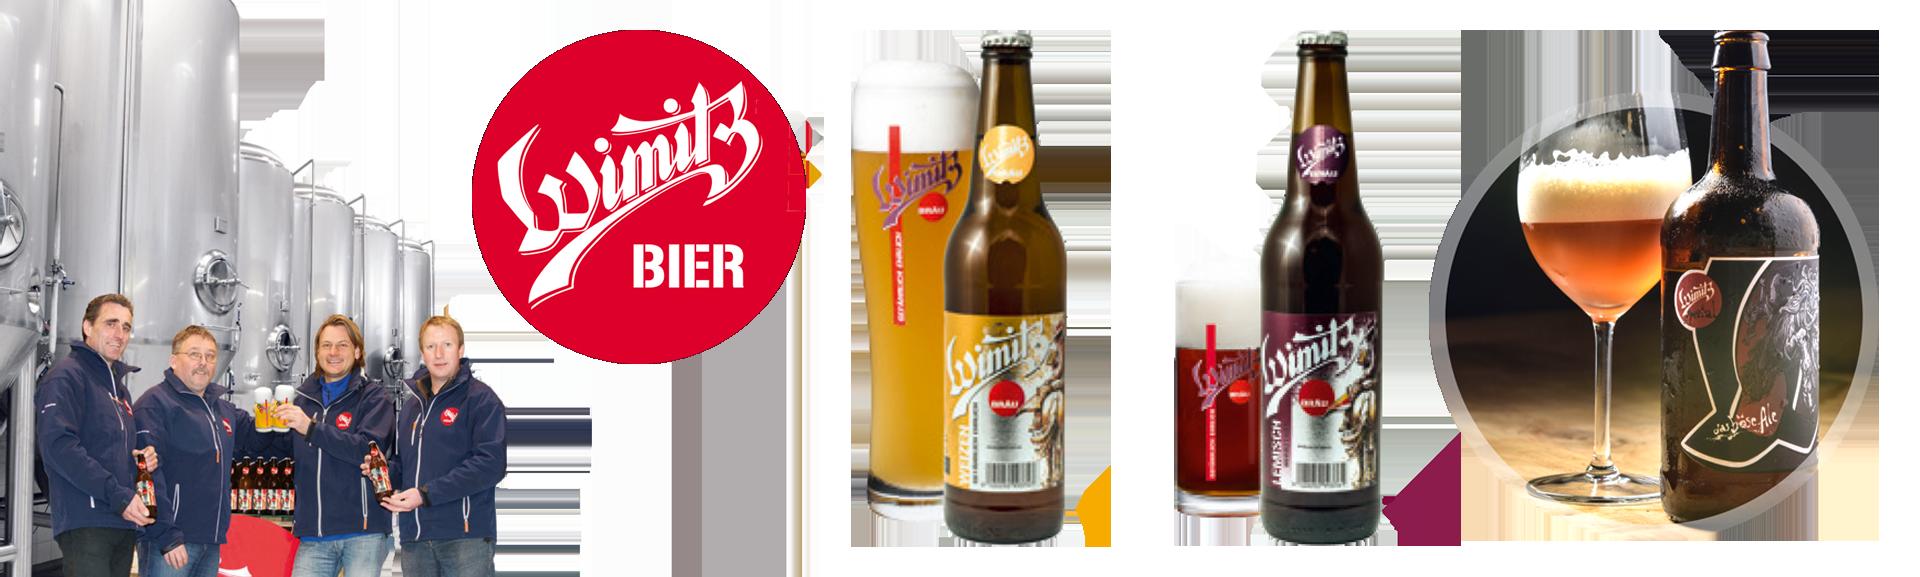 Wimitz-Bier-Slide-Neu